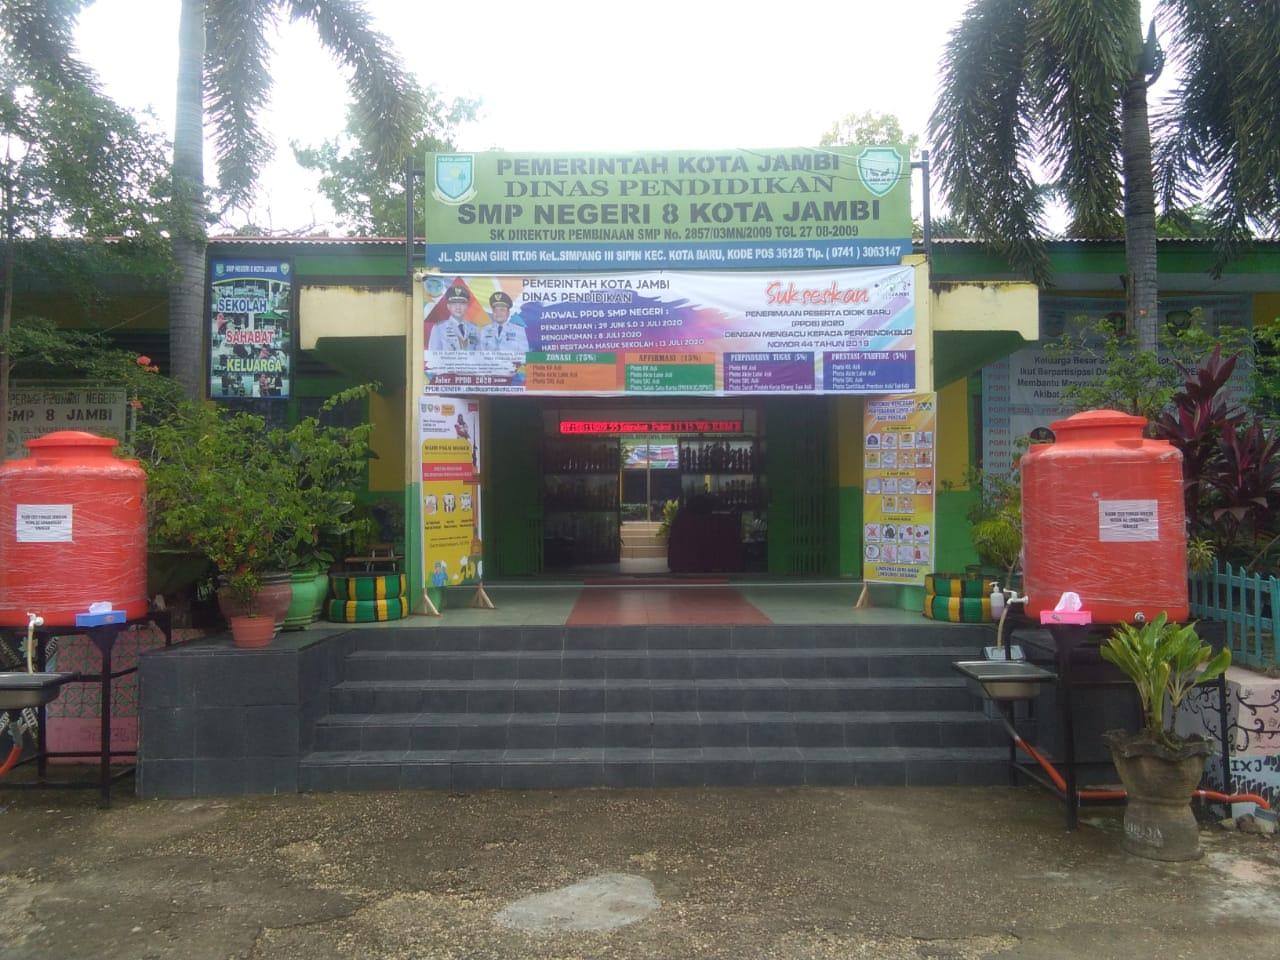 Eduadmission Pendaftaran Online Smp Negeri 008 Jambi